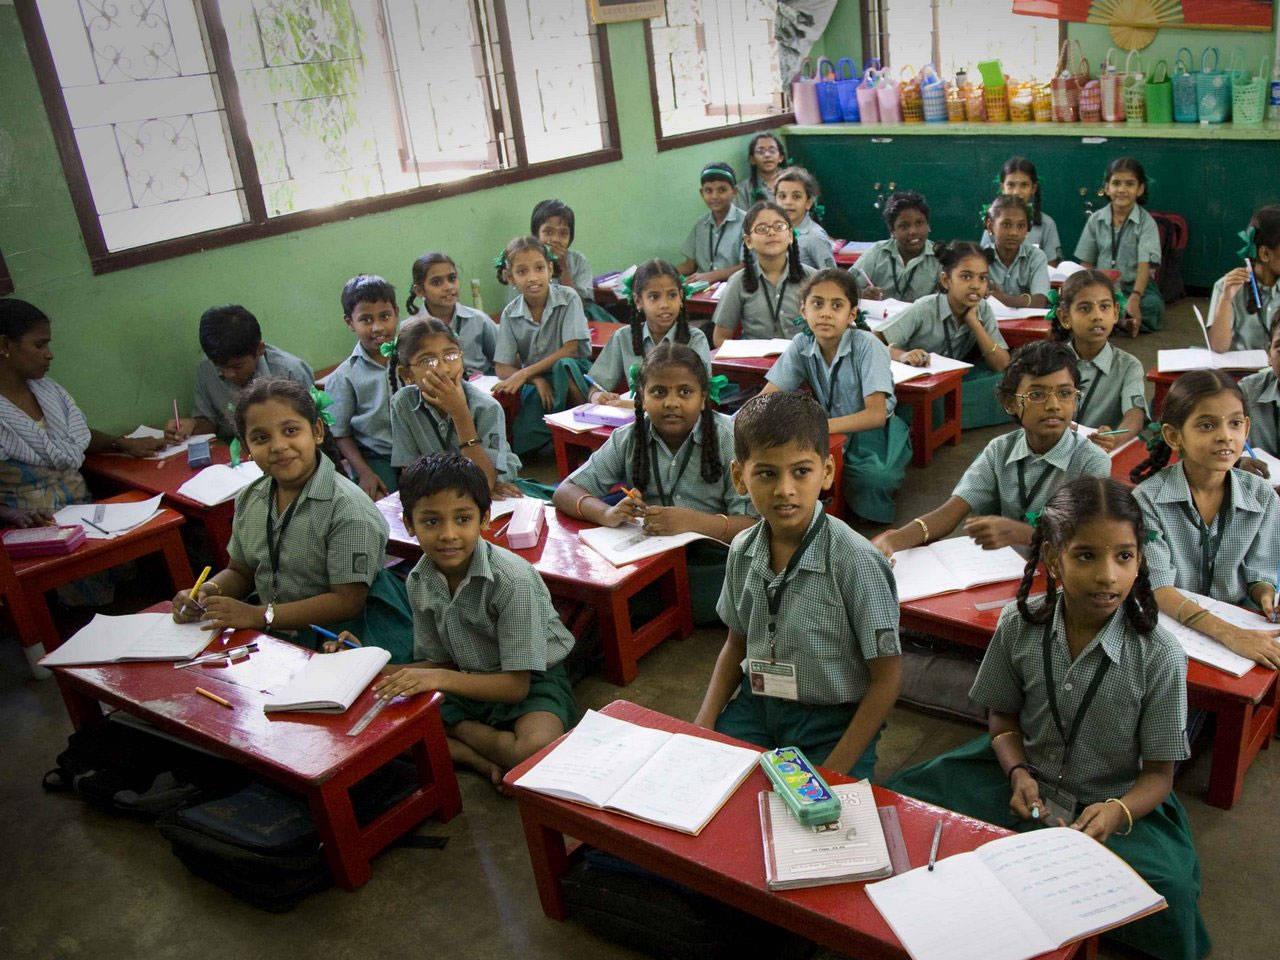 Legislative Council clears bill to make Marathi compulsory across schools in Maharashtra